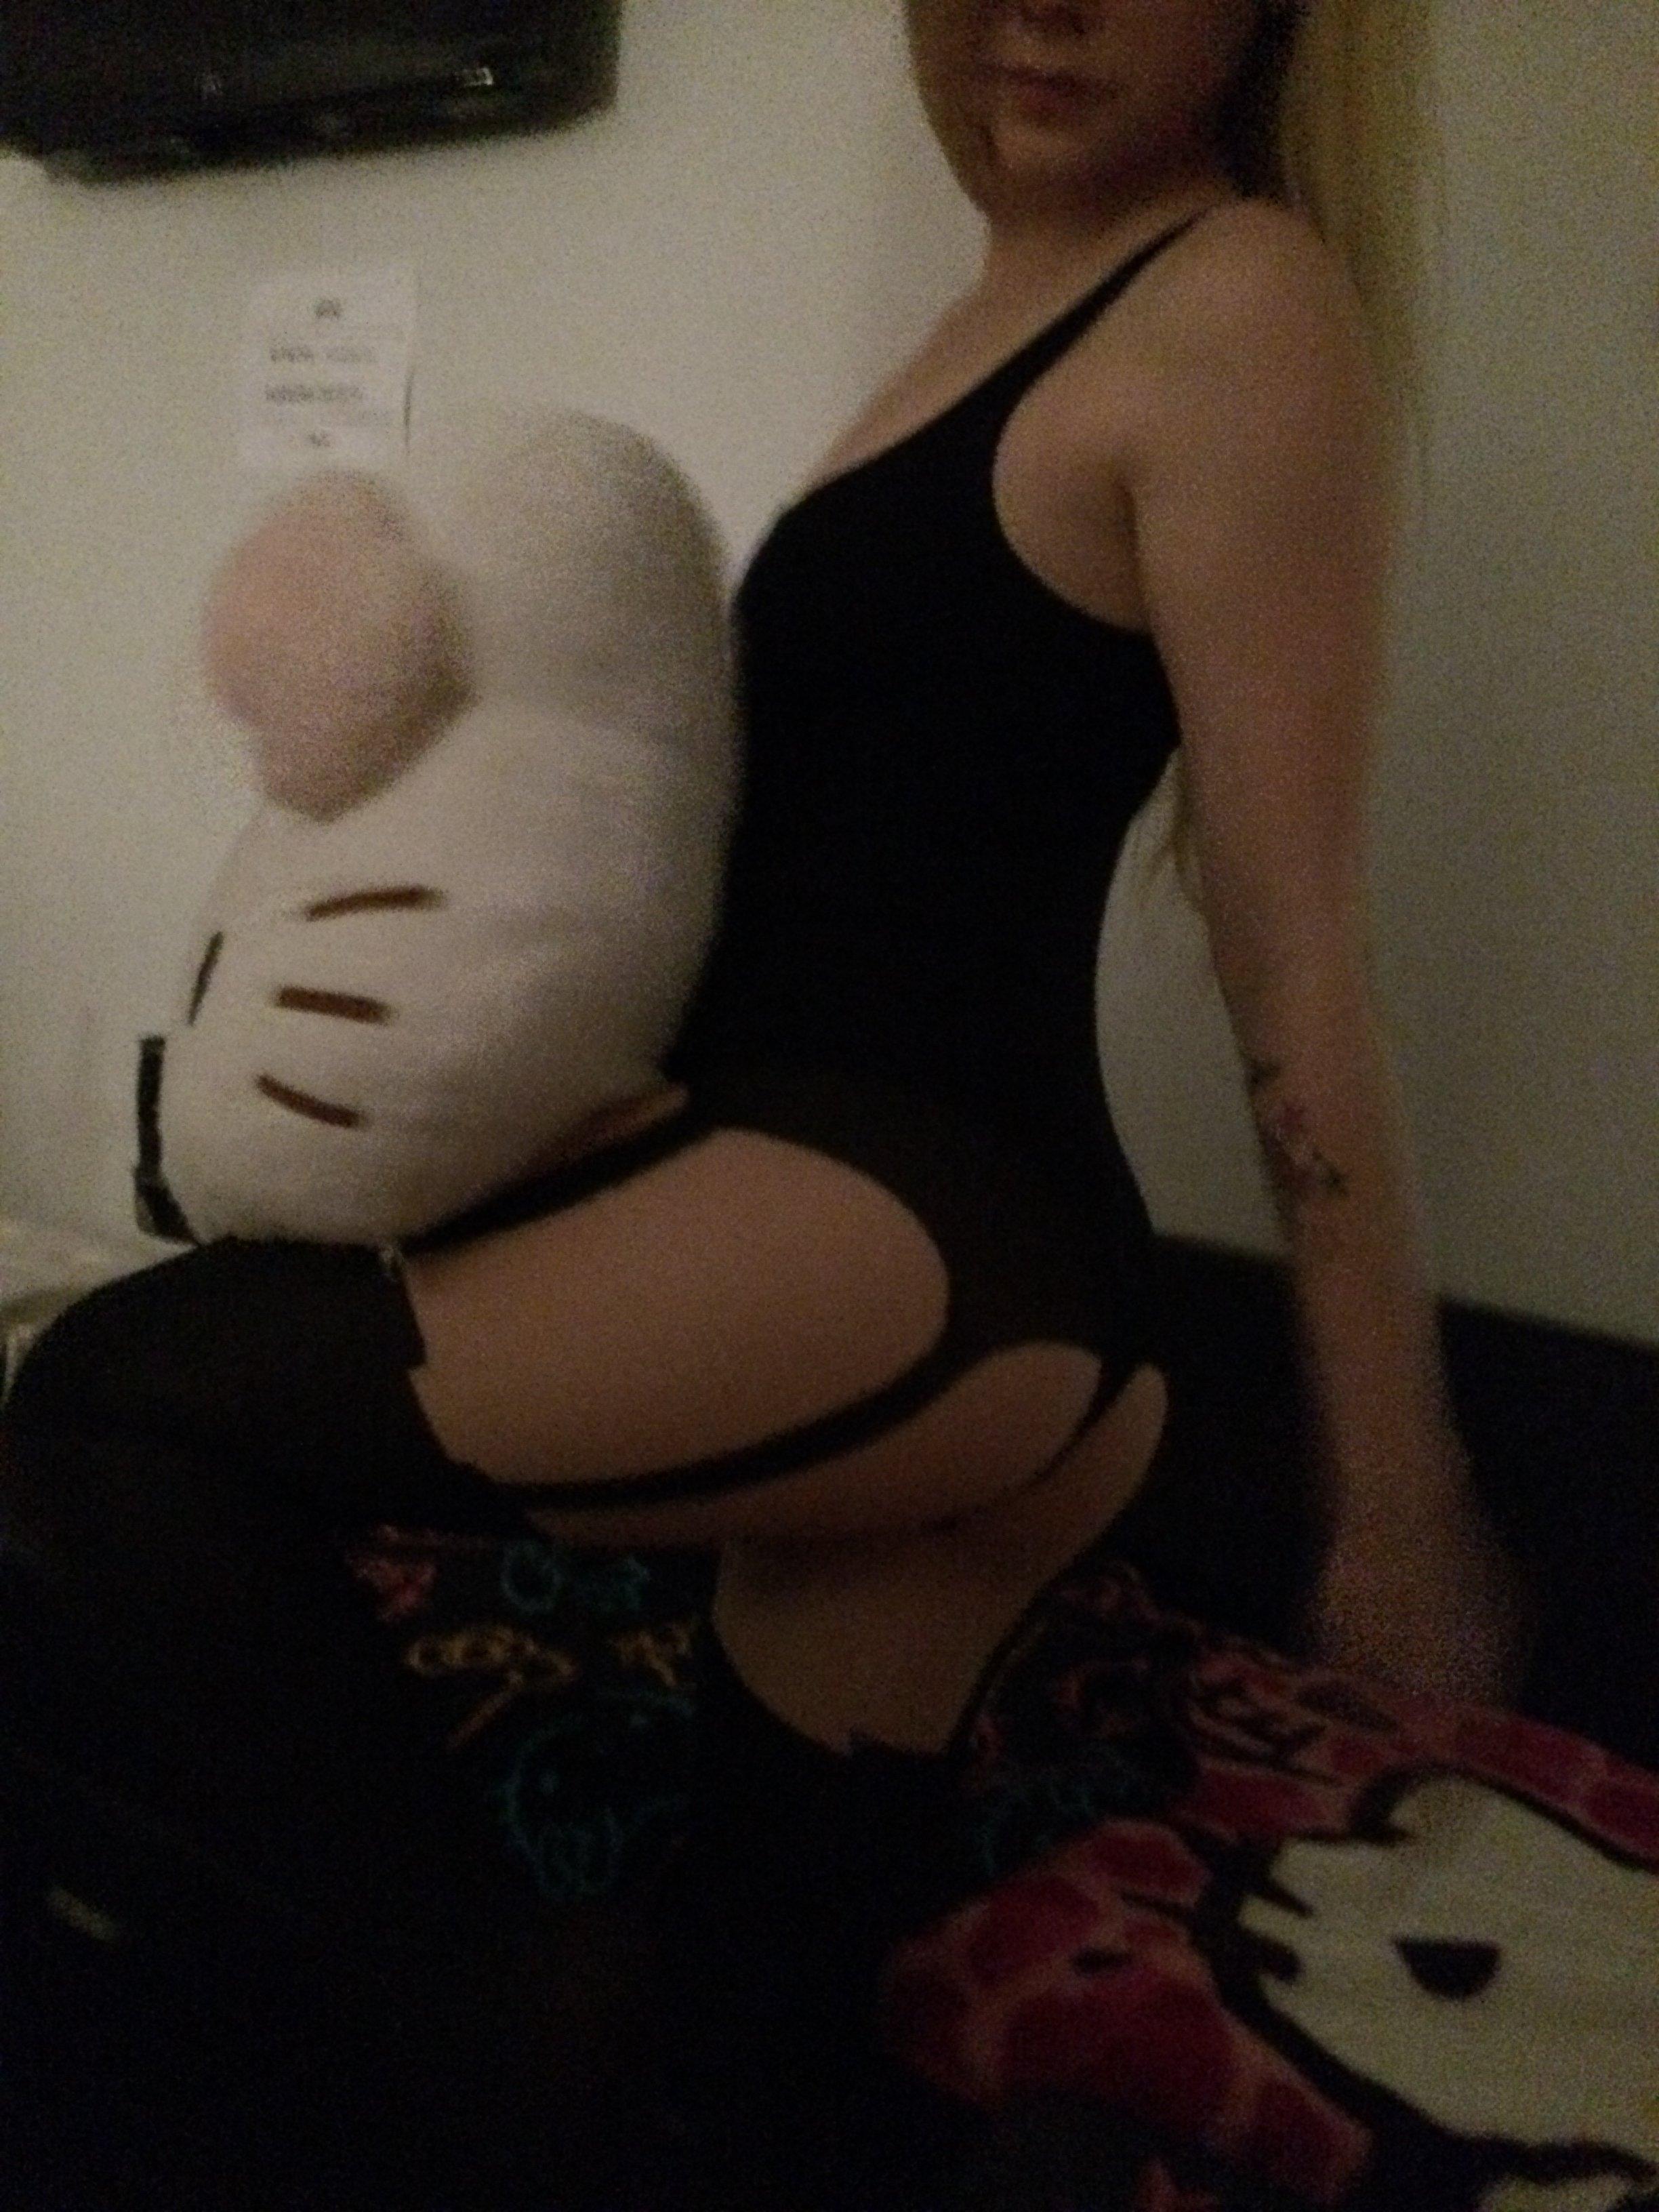 Avril Lavigne tits